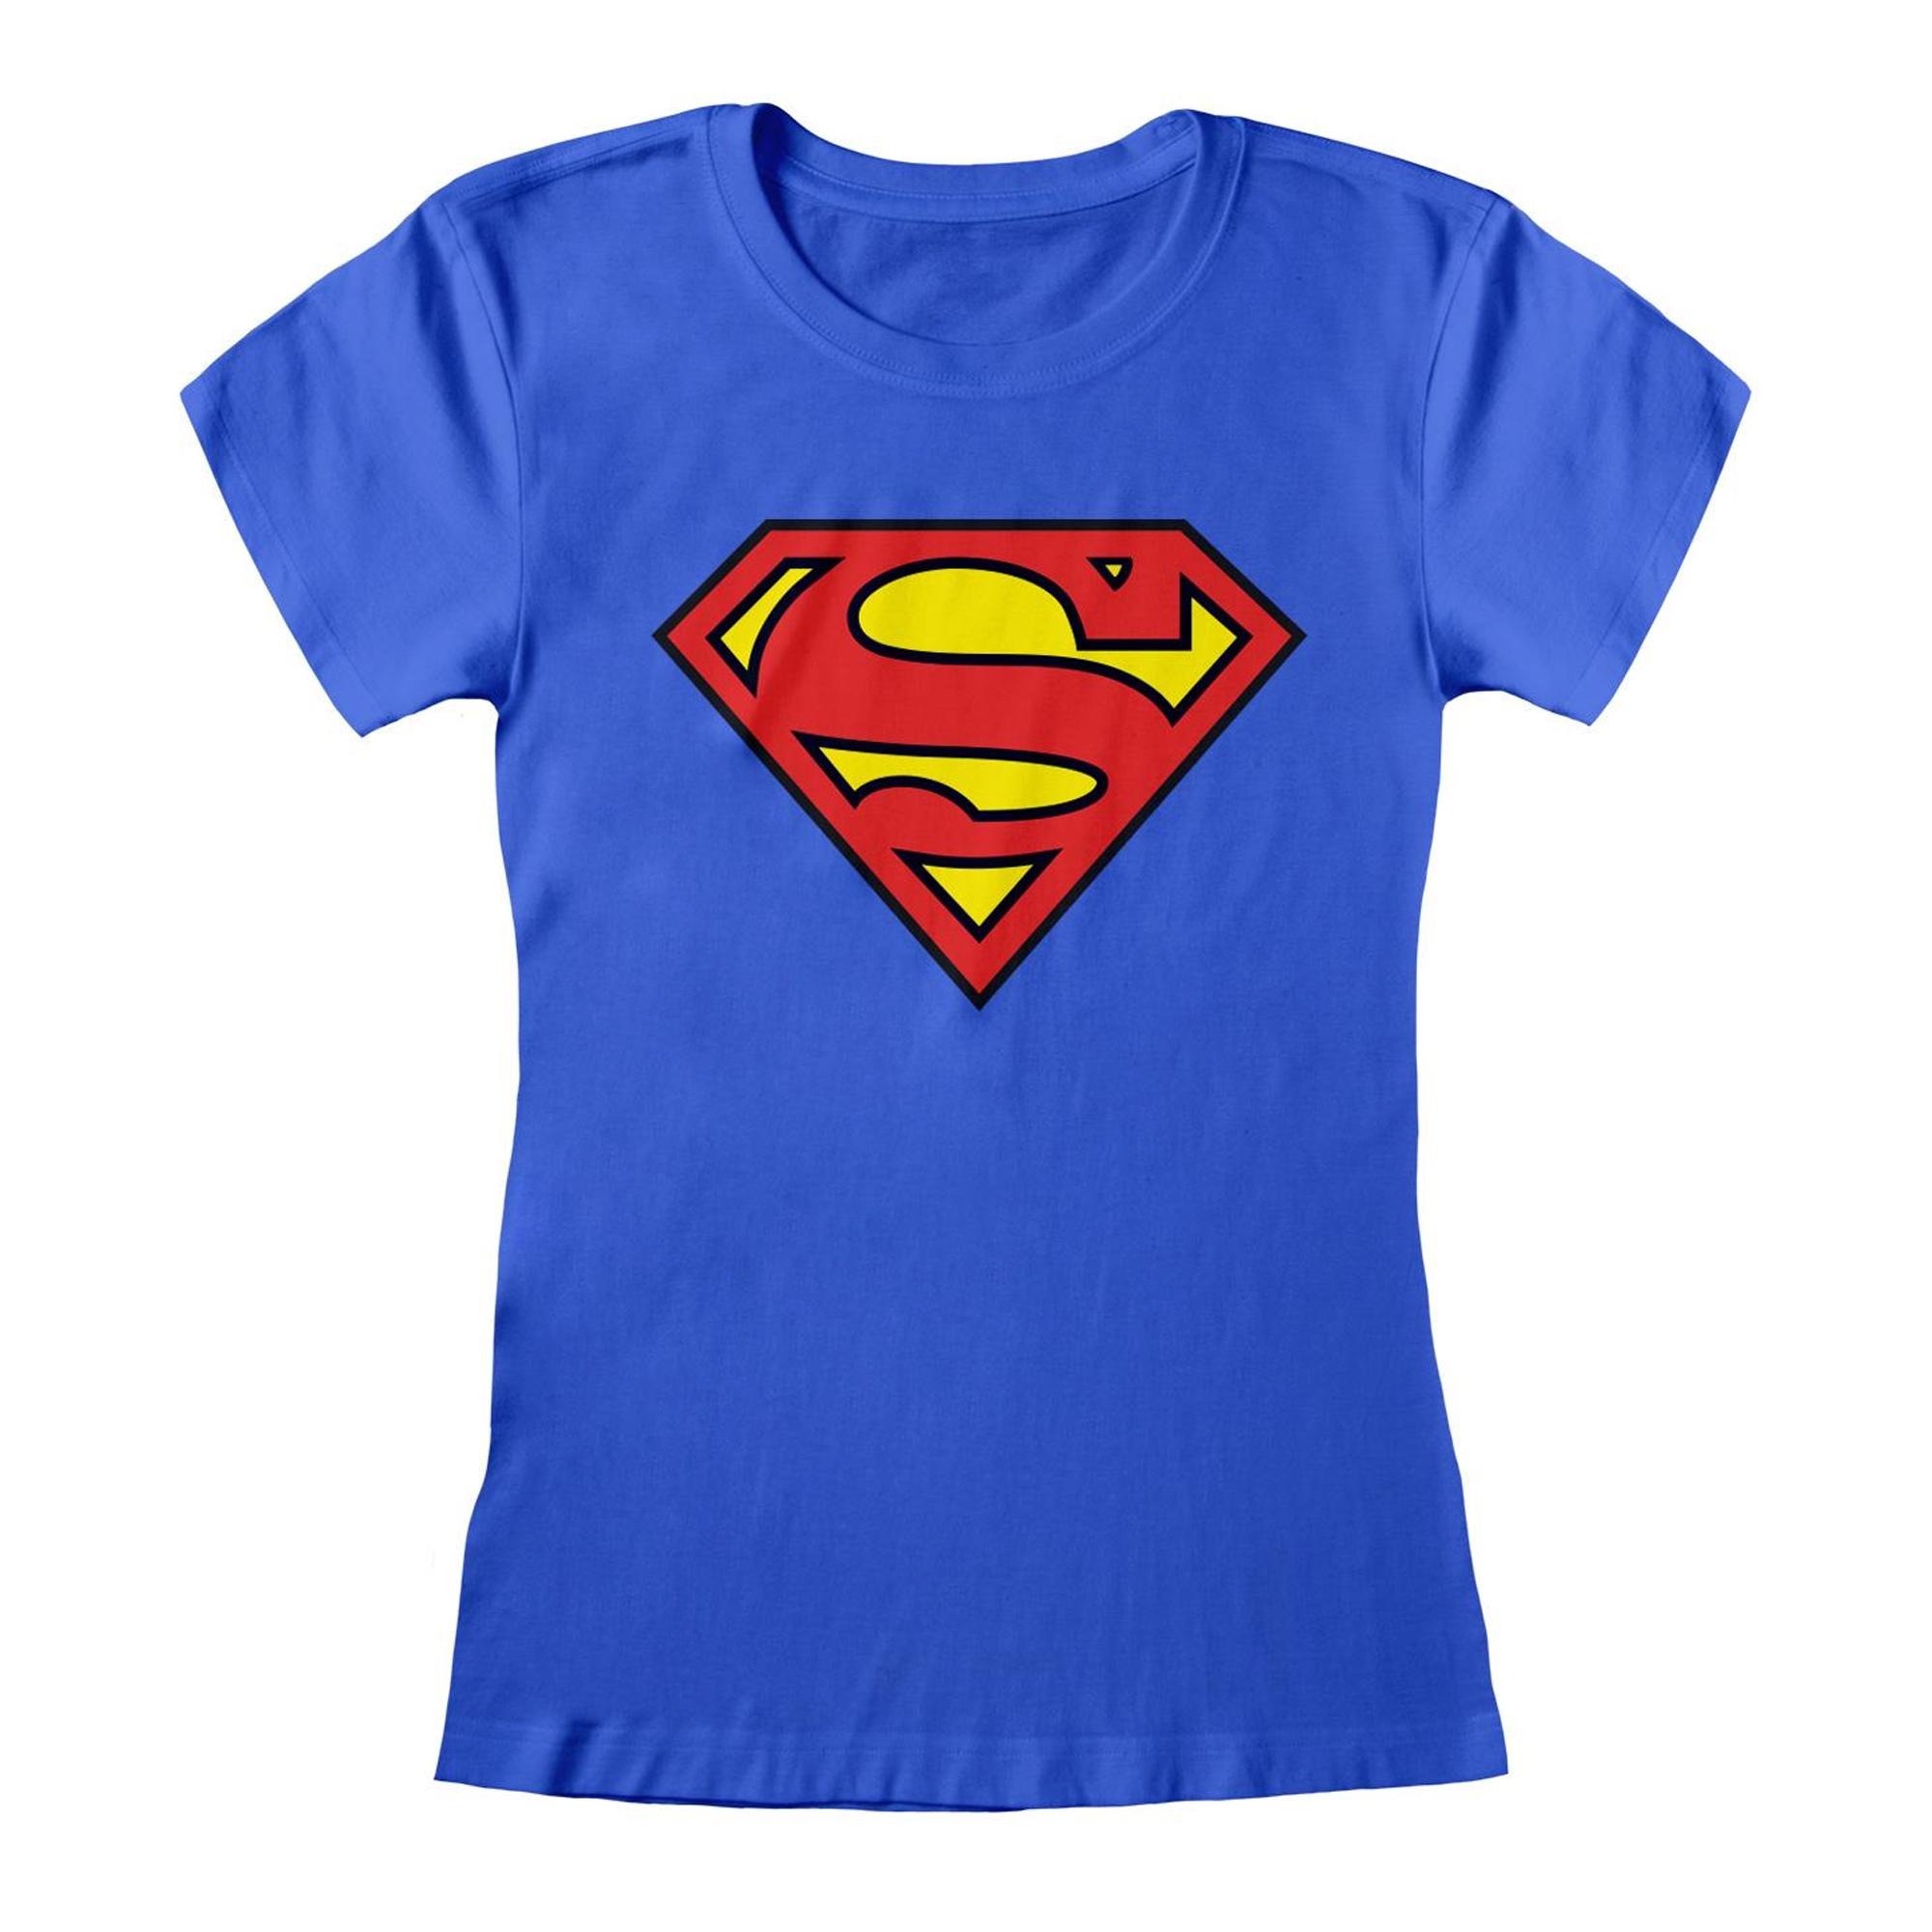 Superman Womens/Ladies Logo Fitted T-Shirt (M) (Royal Blue)